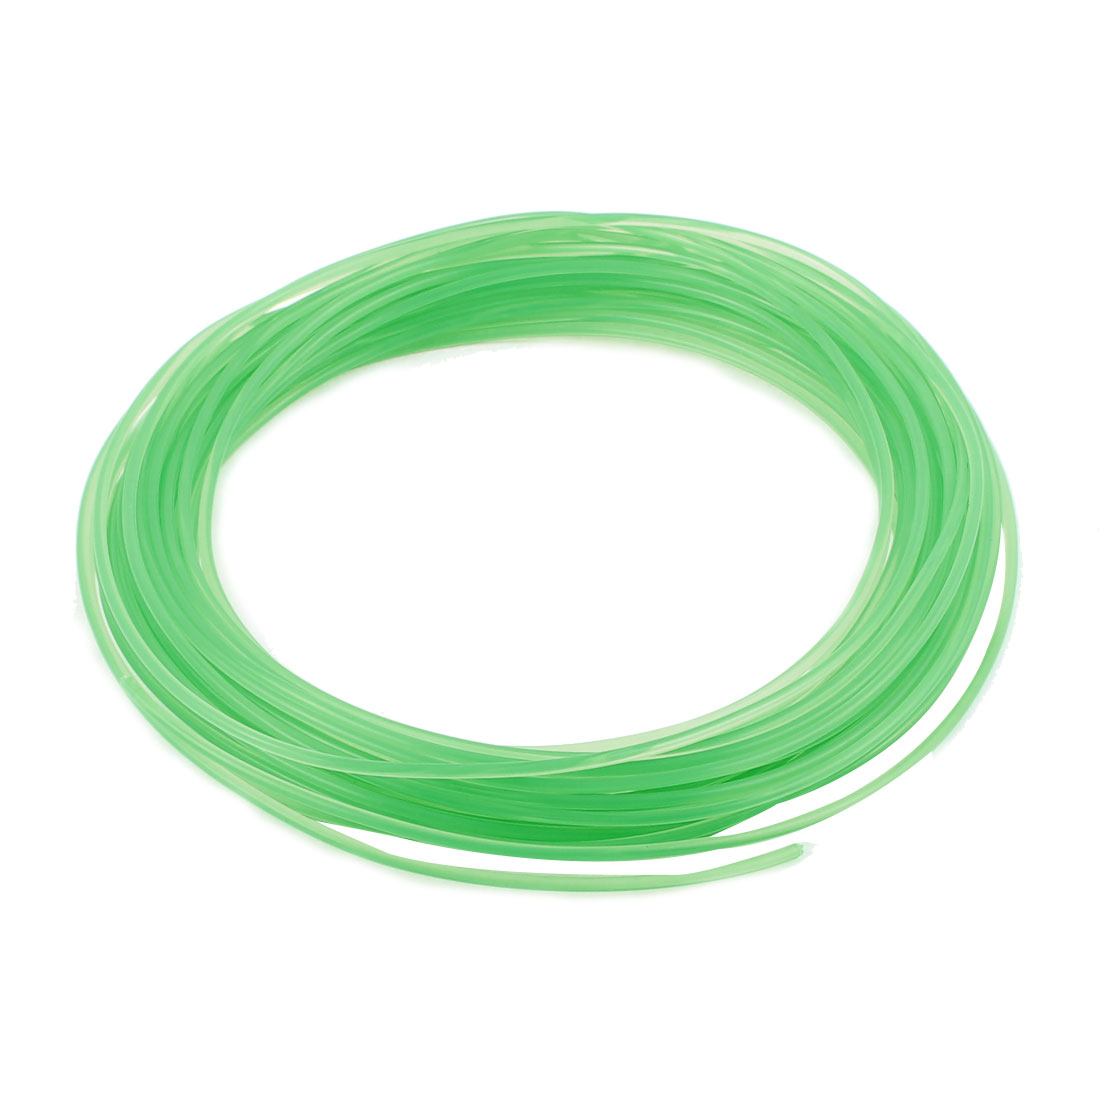 10m 3D Printer Pen Painting Filament Refills PLA Printing Material Grass Green